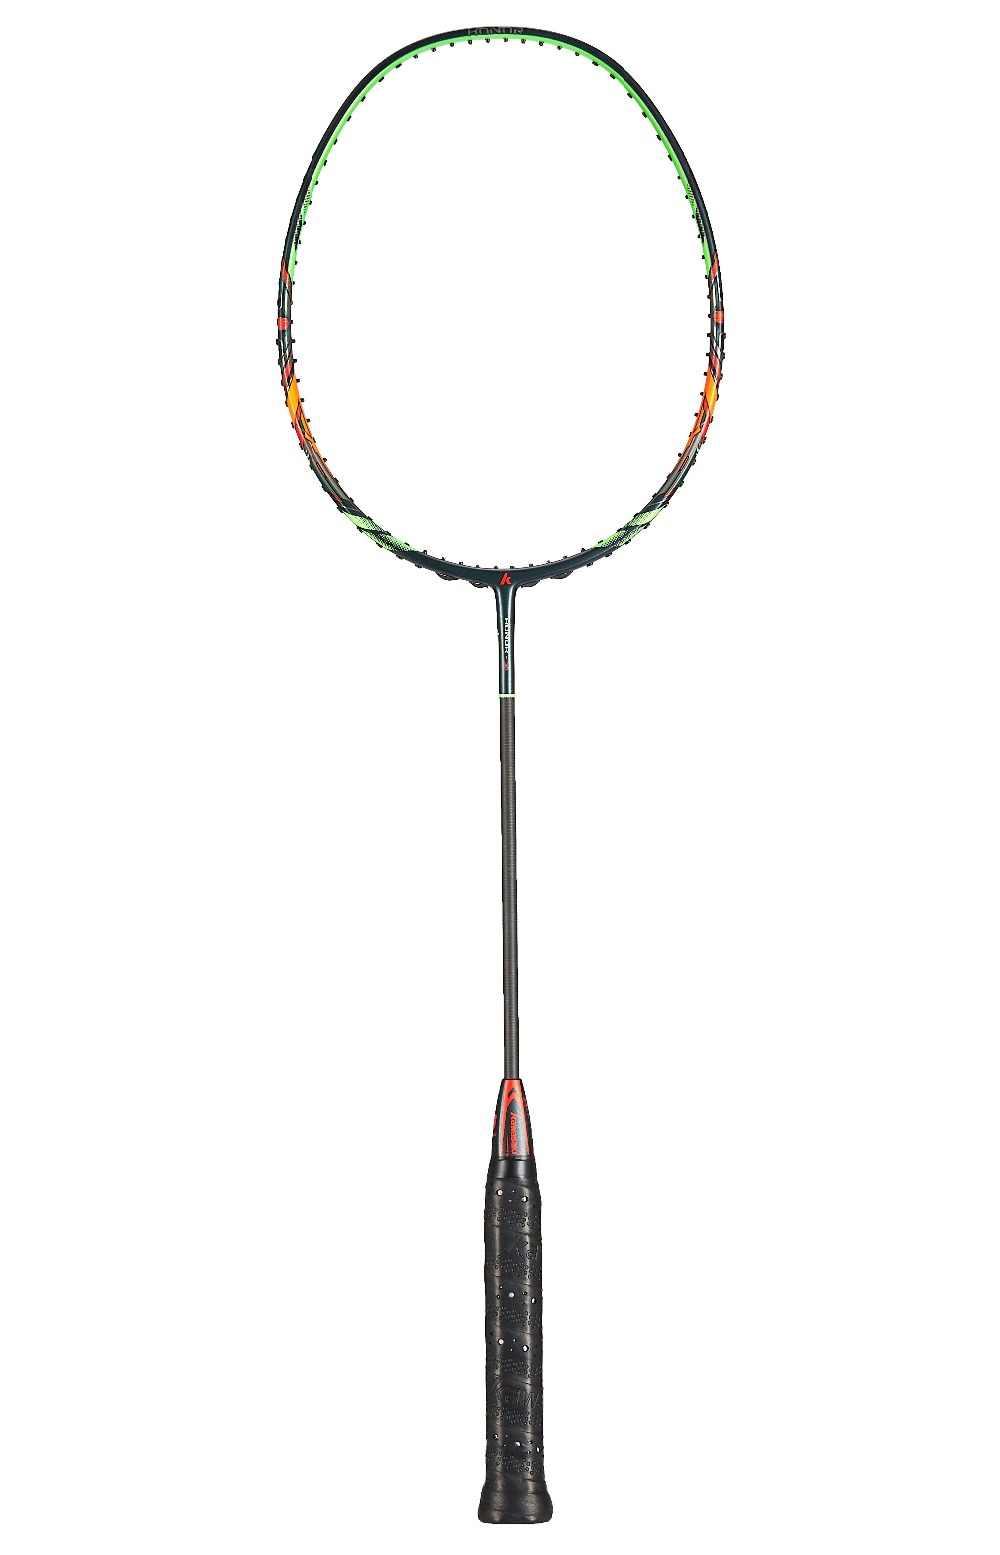 2019 Kawasaki 4U Attack Type Badminton Rackets HONOR S6 30T Carbon Fiber Box Frame Racquet For Amateur Intermediate Players